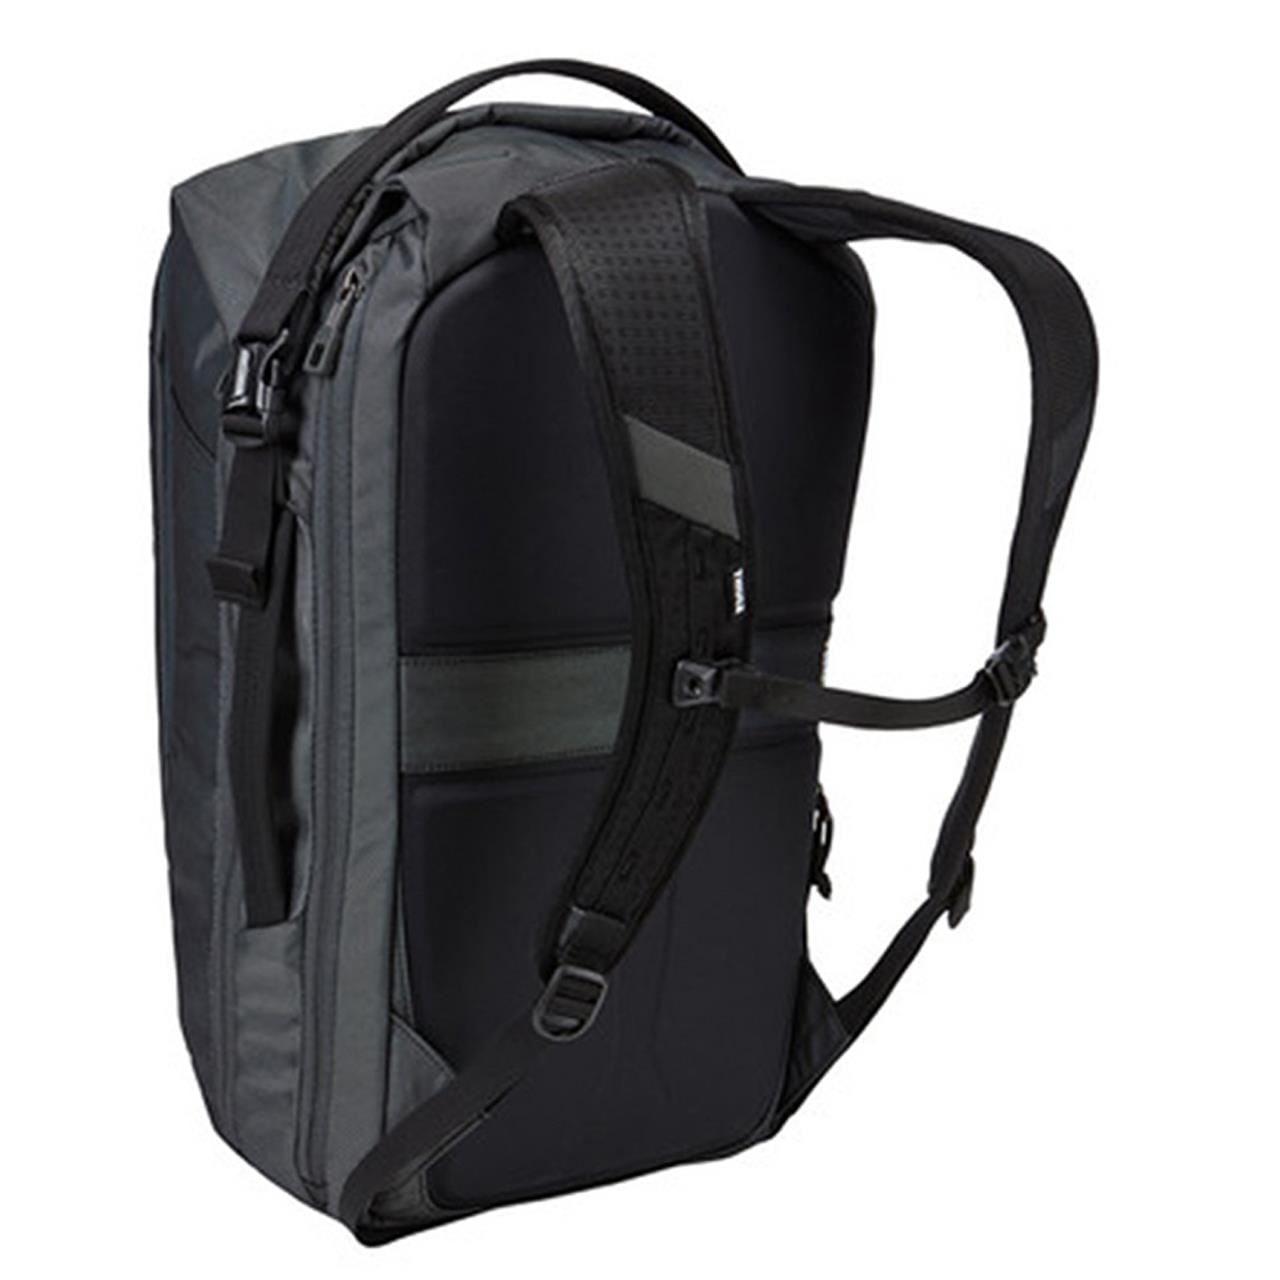 Rucsac urban cu compartiment laptop Thule Subterra Travel Backpack 34L Dark Shadow 10